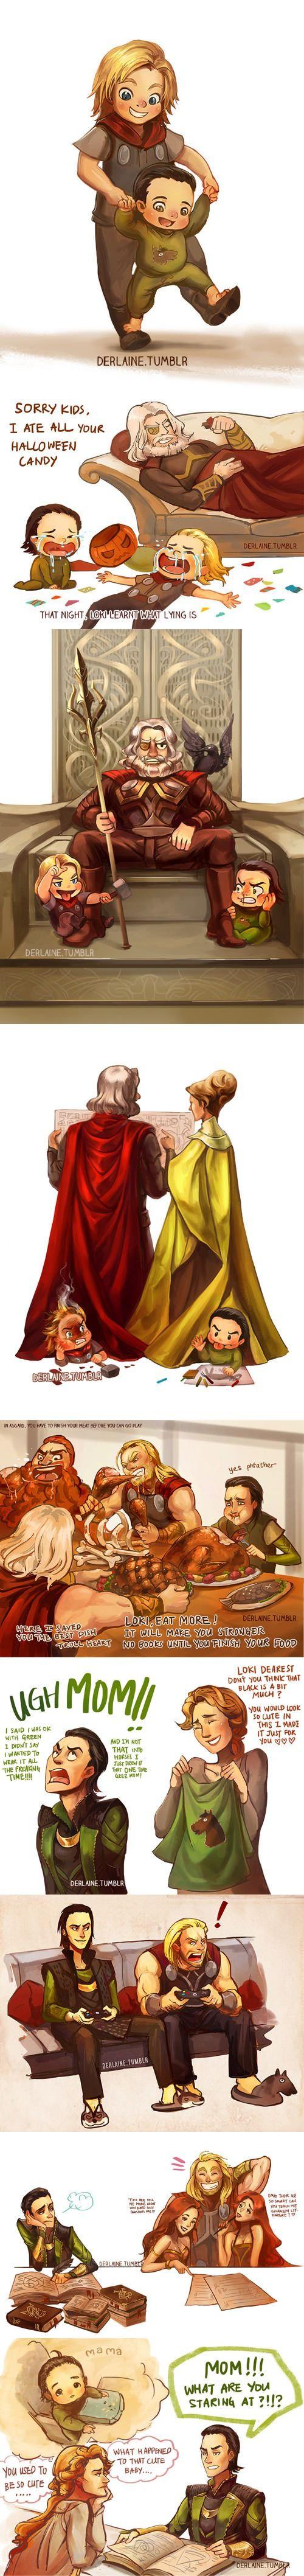 Thor and Loki's childhood || Thor Odinson, Loki Laufeyson, Odin, Frigga || 500px × 4,234px || #fanart